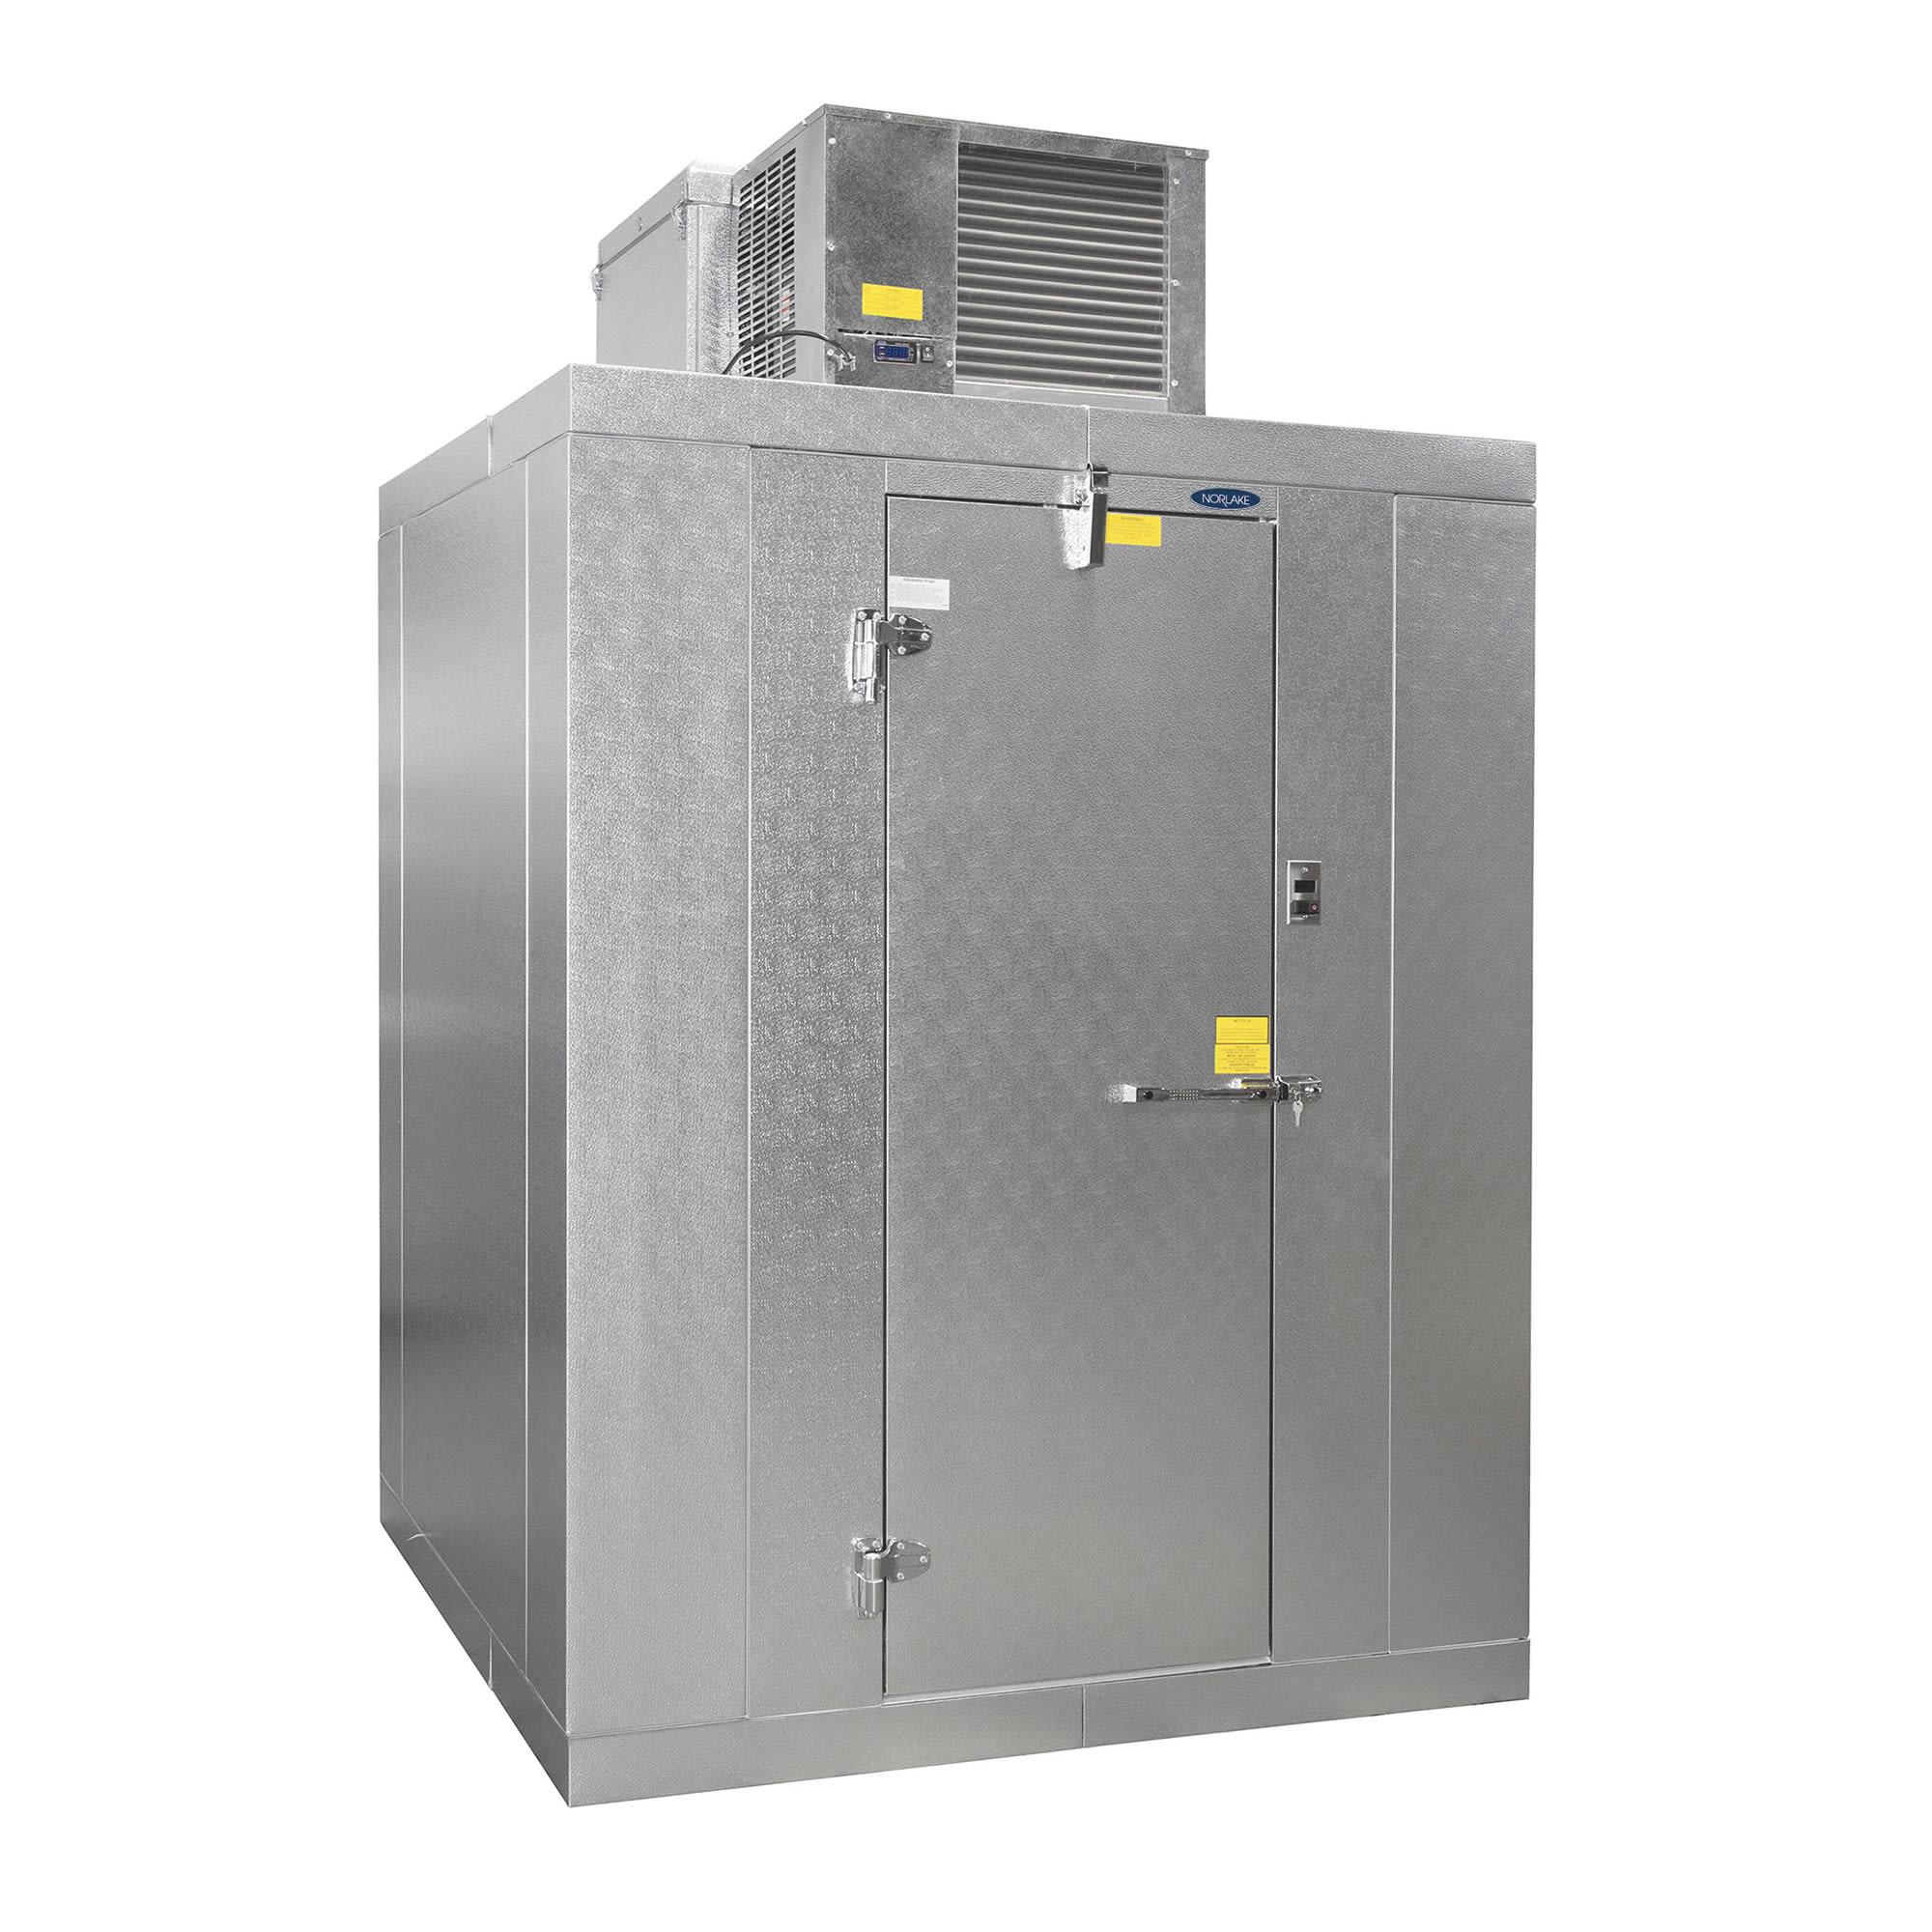 Norlake KODB77612-C Outdoor Walk-In Refrigerator w/ Top Mount Compressor, 6' x 12'